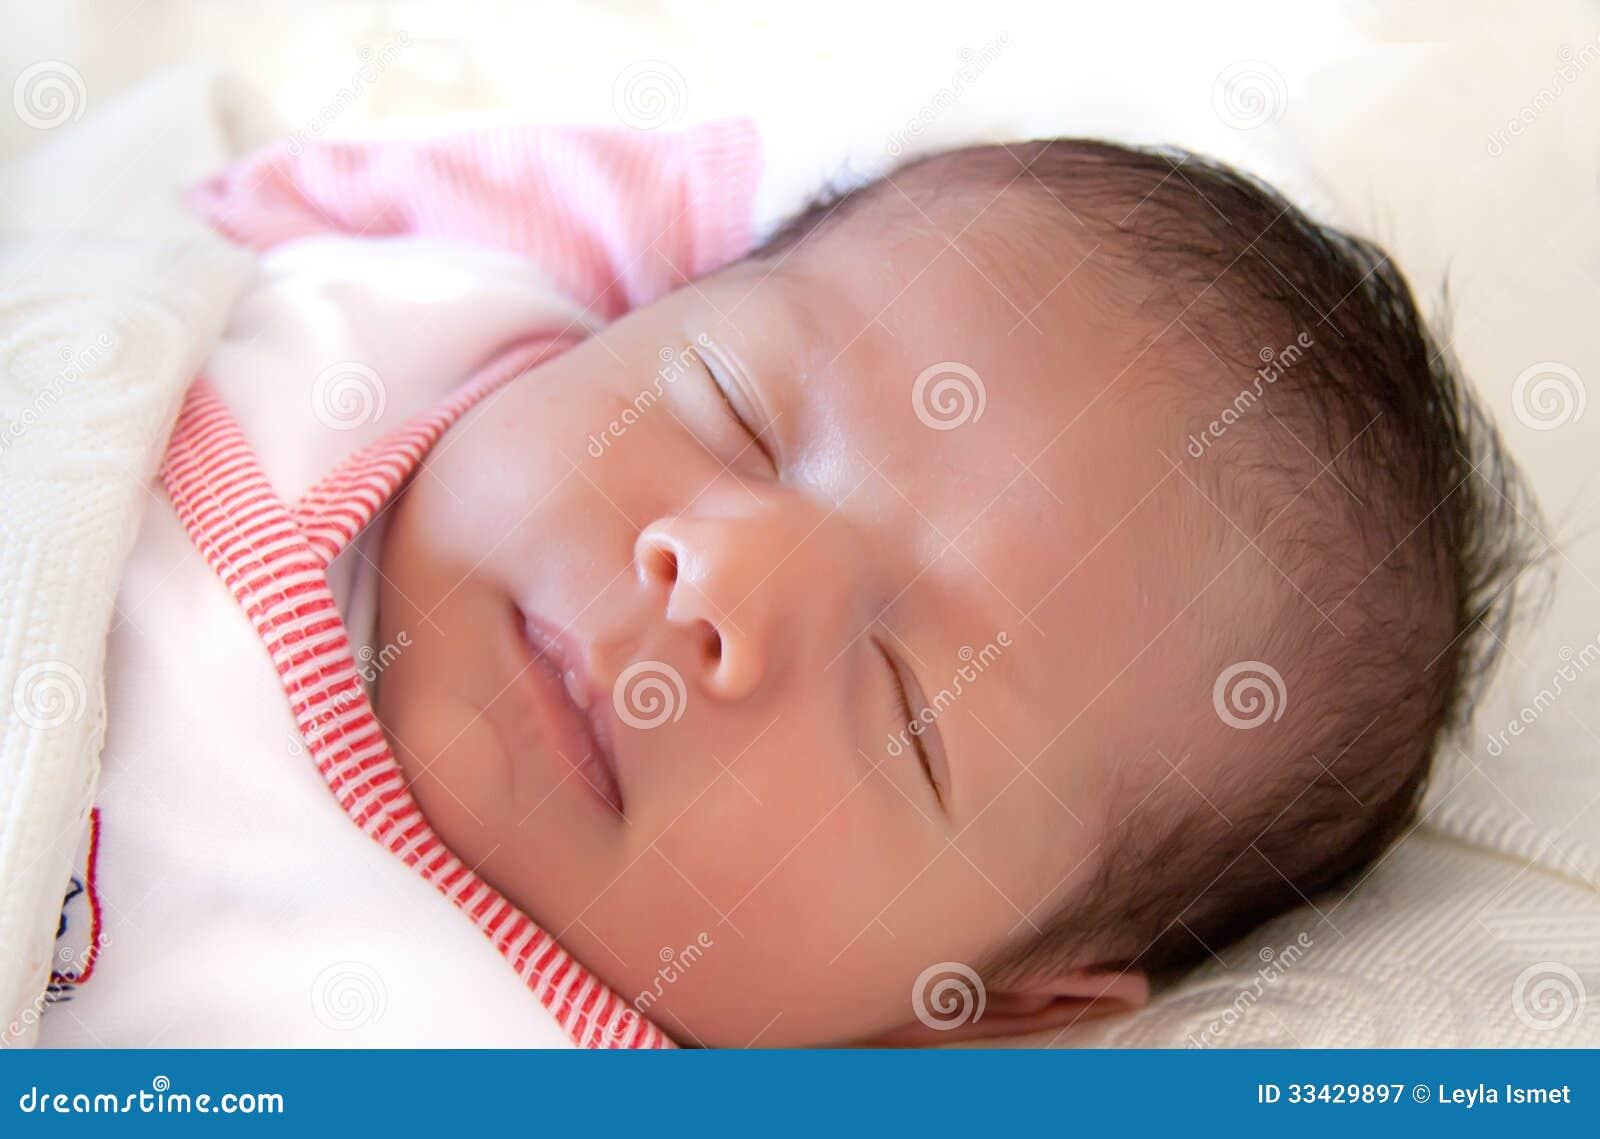 Newborn baby boy asleep stock photo. Image of human